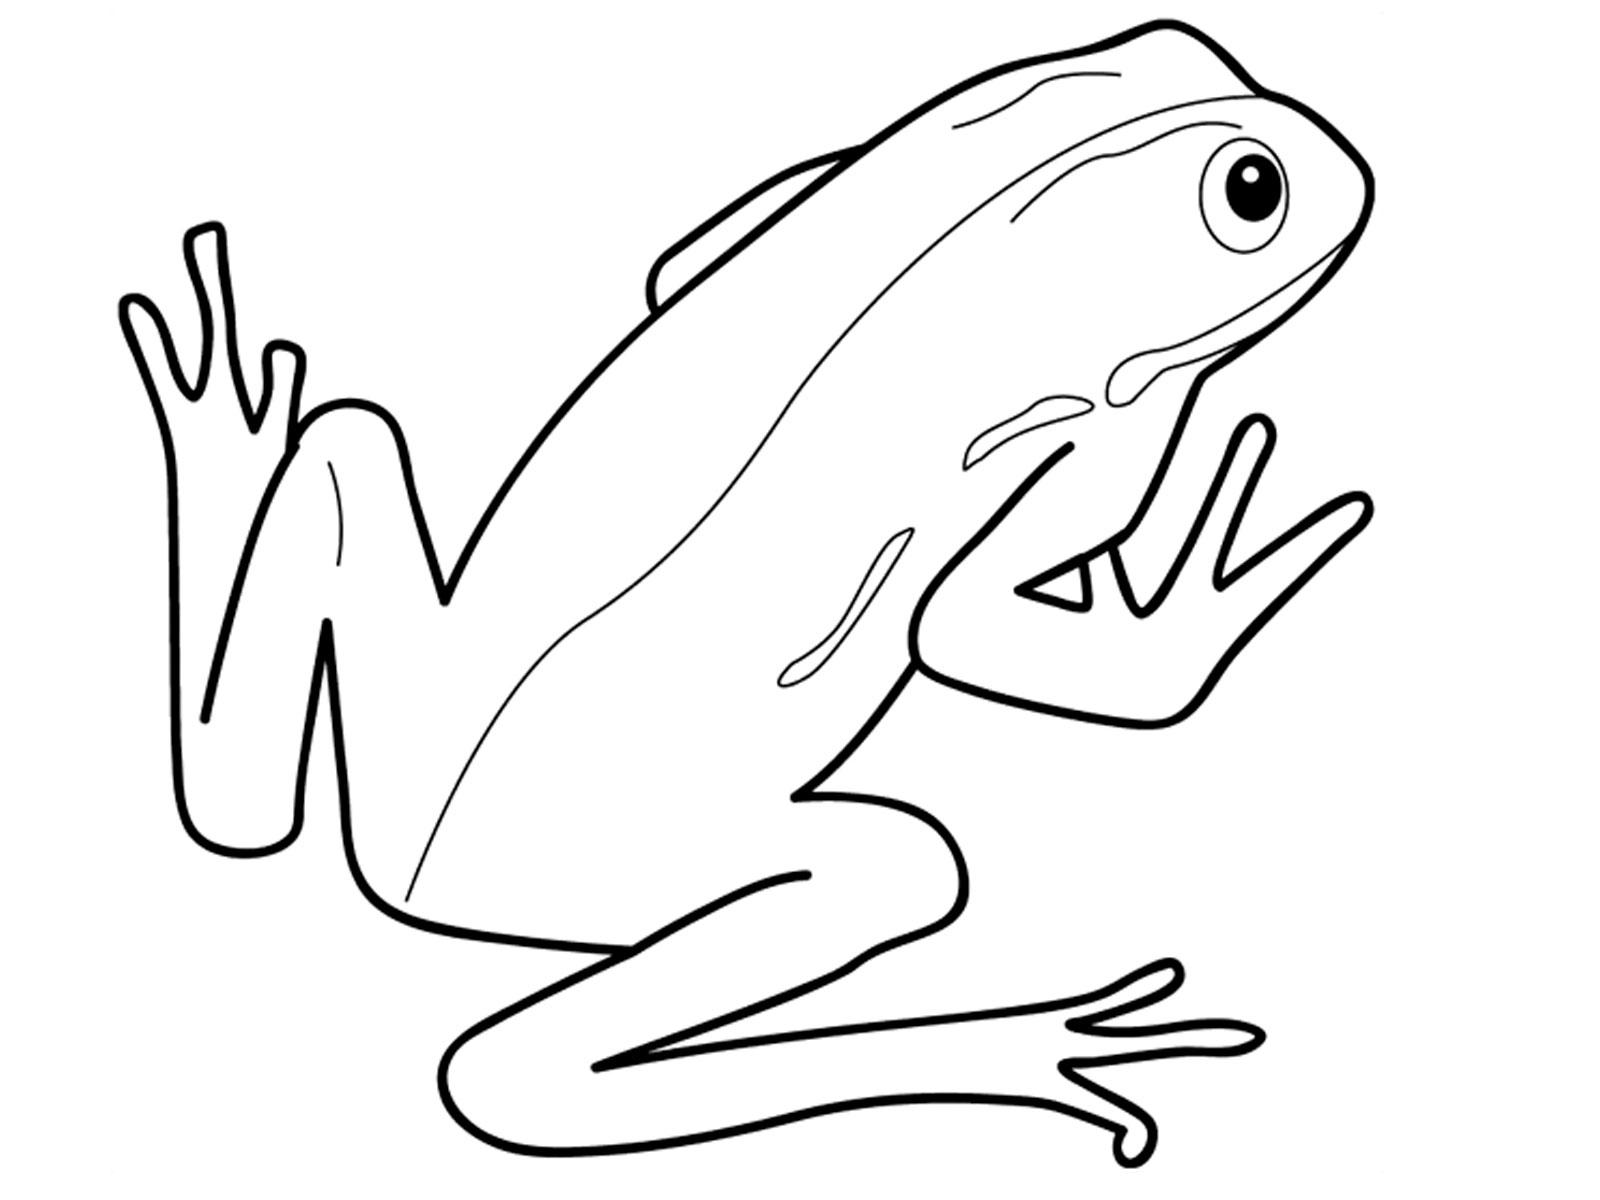 Amphibian Drawing At Getdrawings